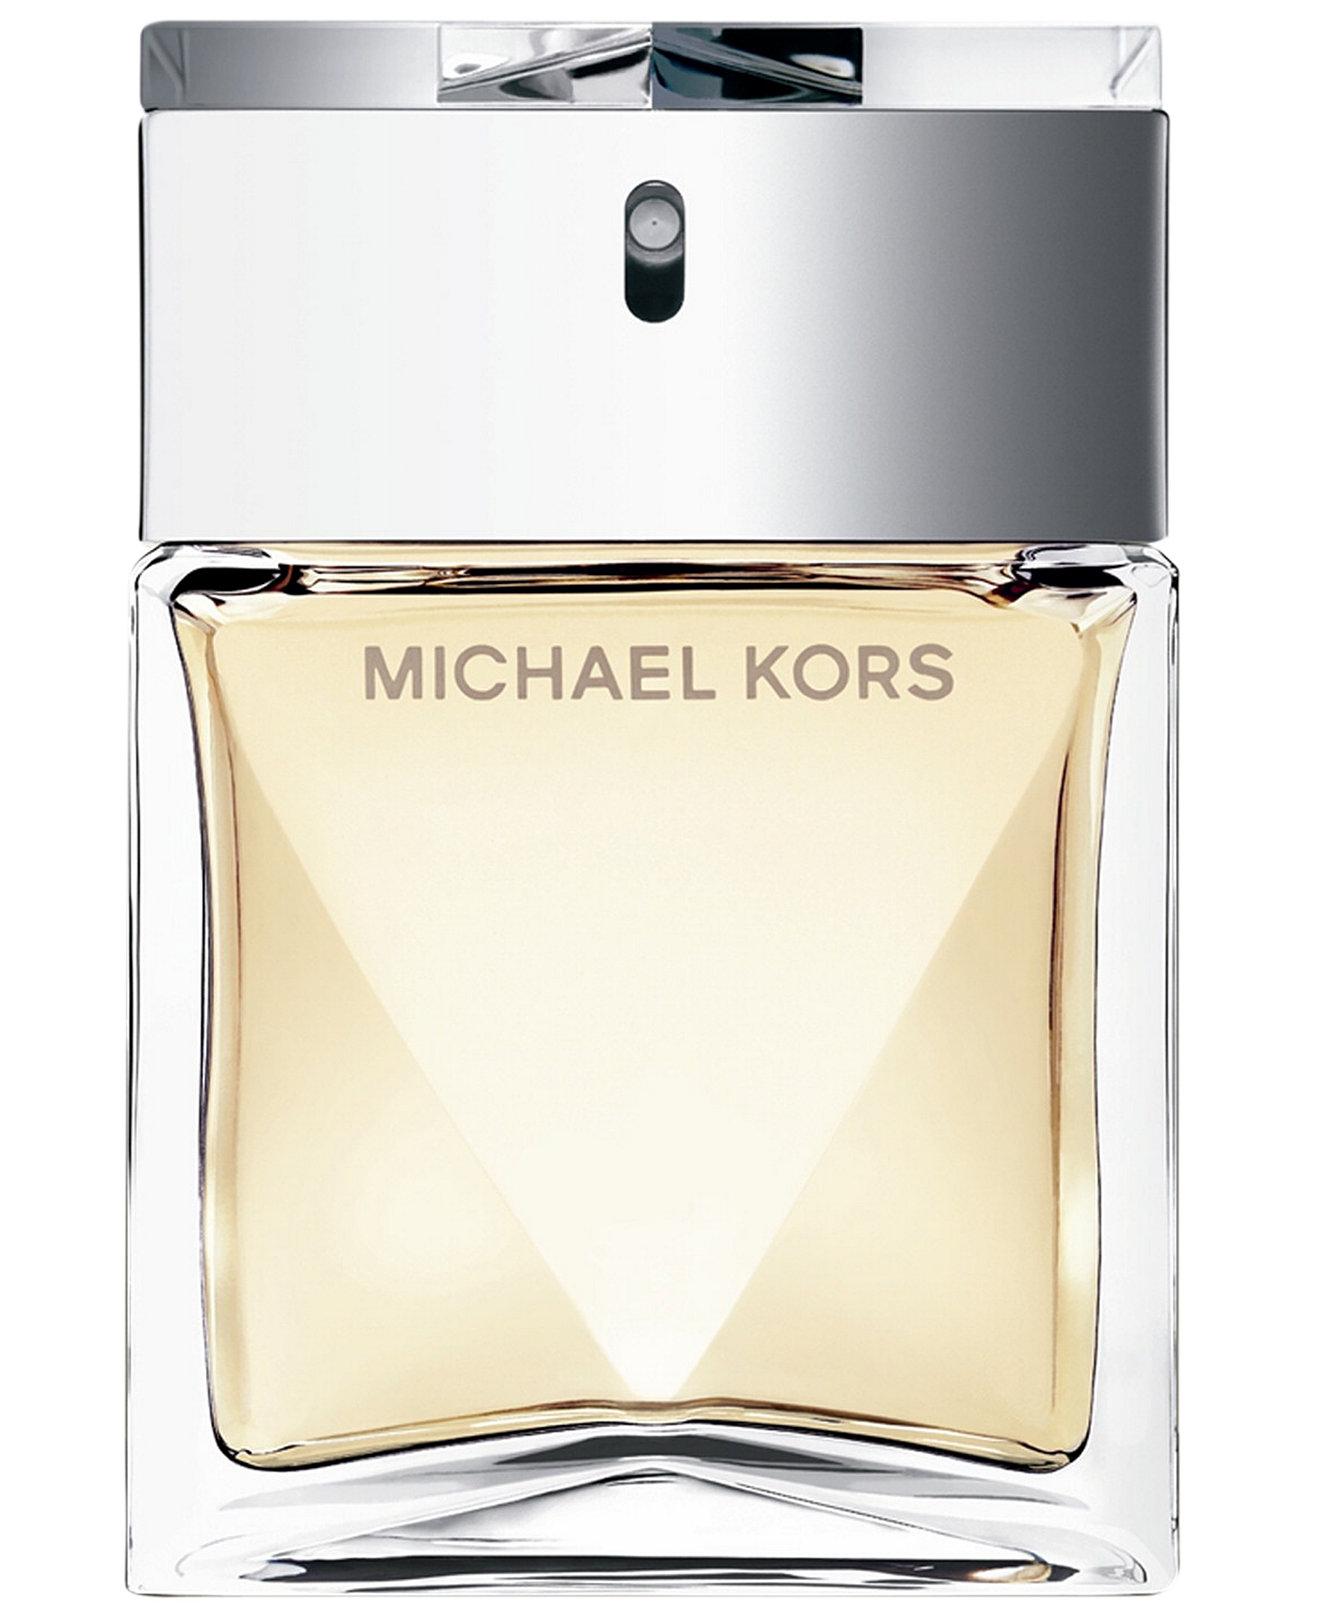 kourtney kardashian favorite perfume michael by michael kors rh scentbird com michael kors men's fragrance model